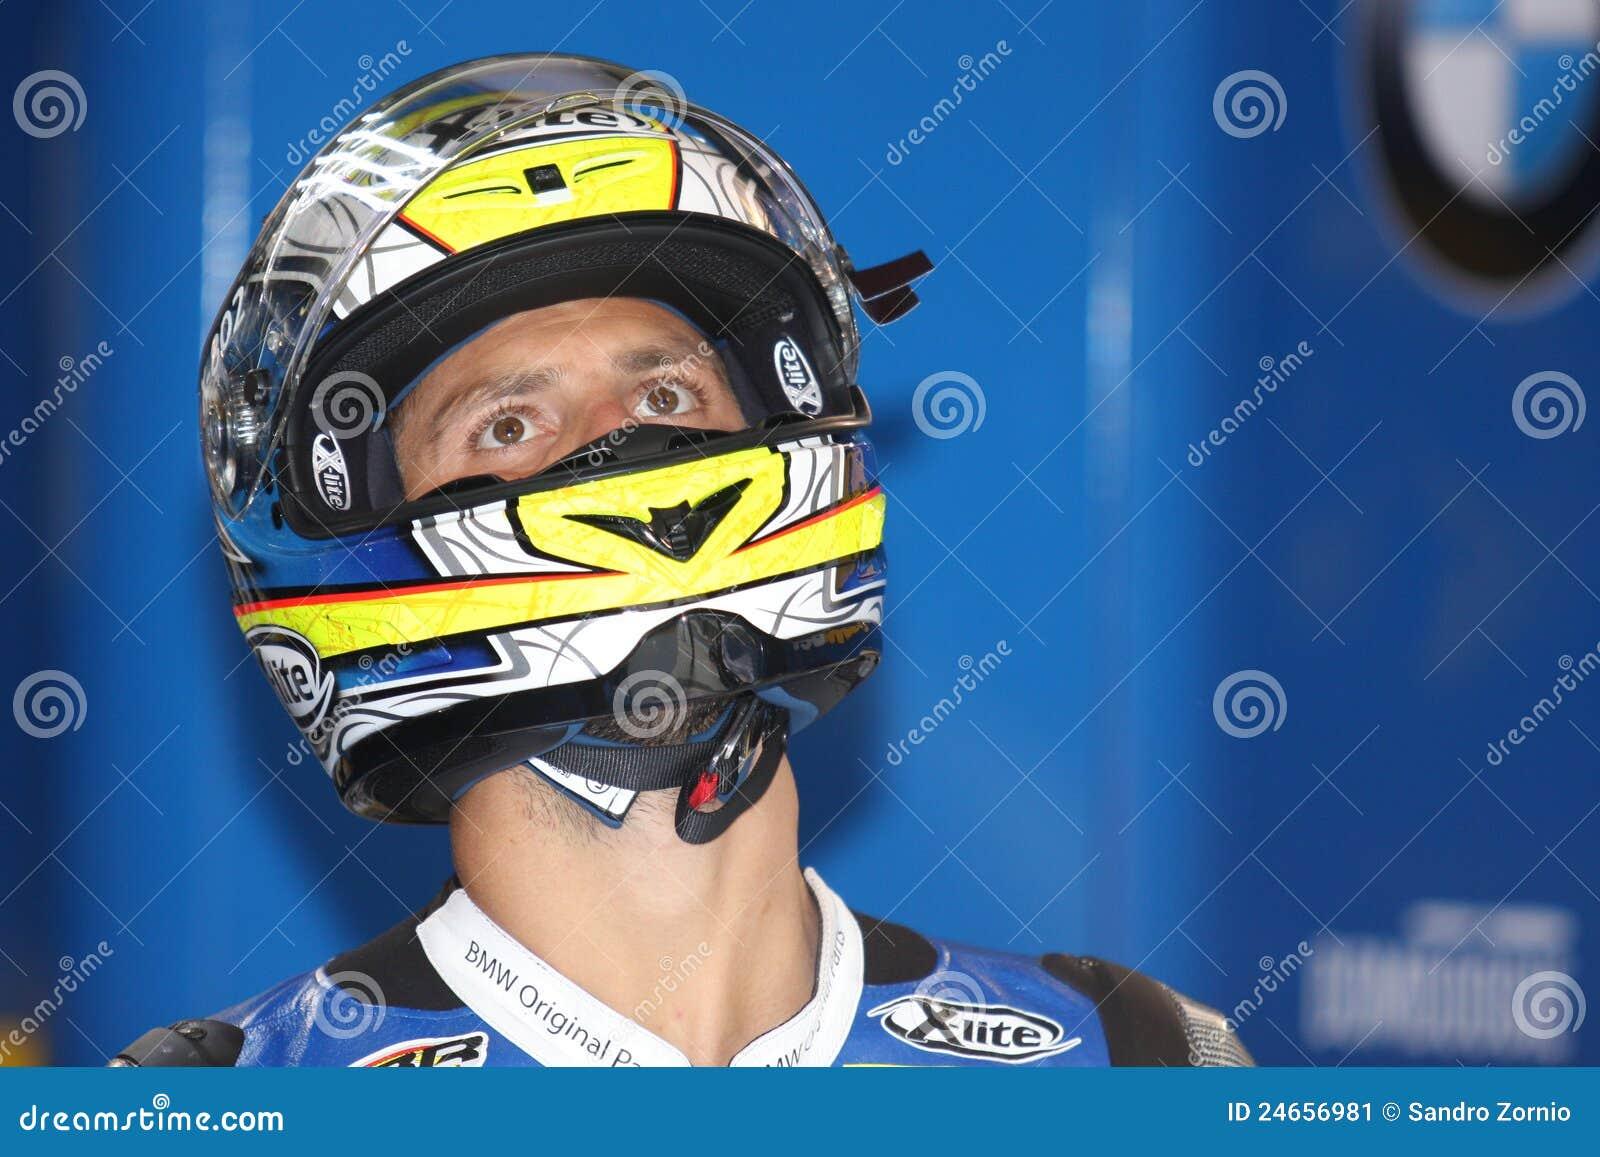 Michel Fabrizio BMW S1000 RR - BMW Motorsport